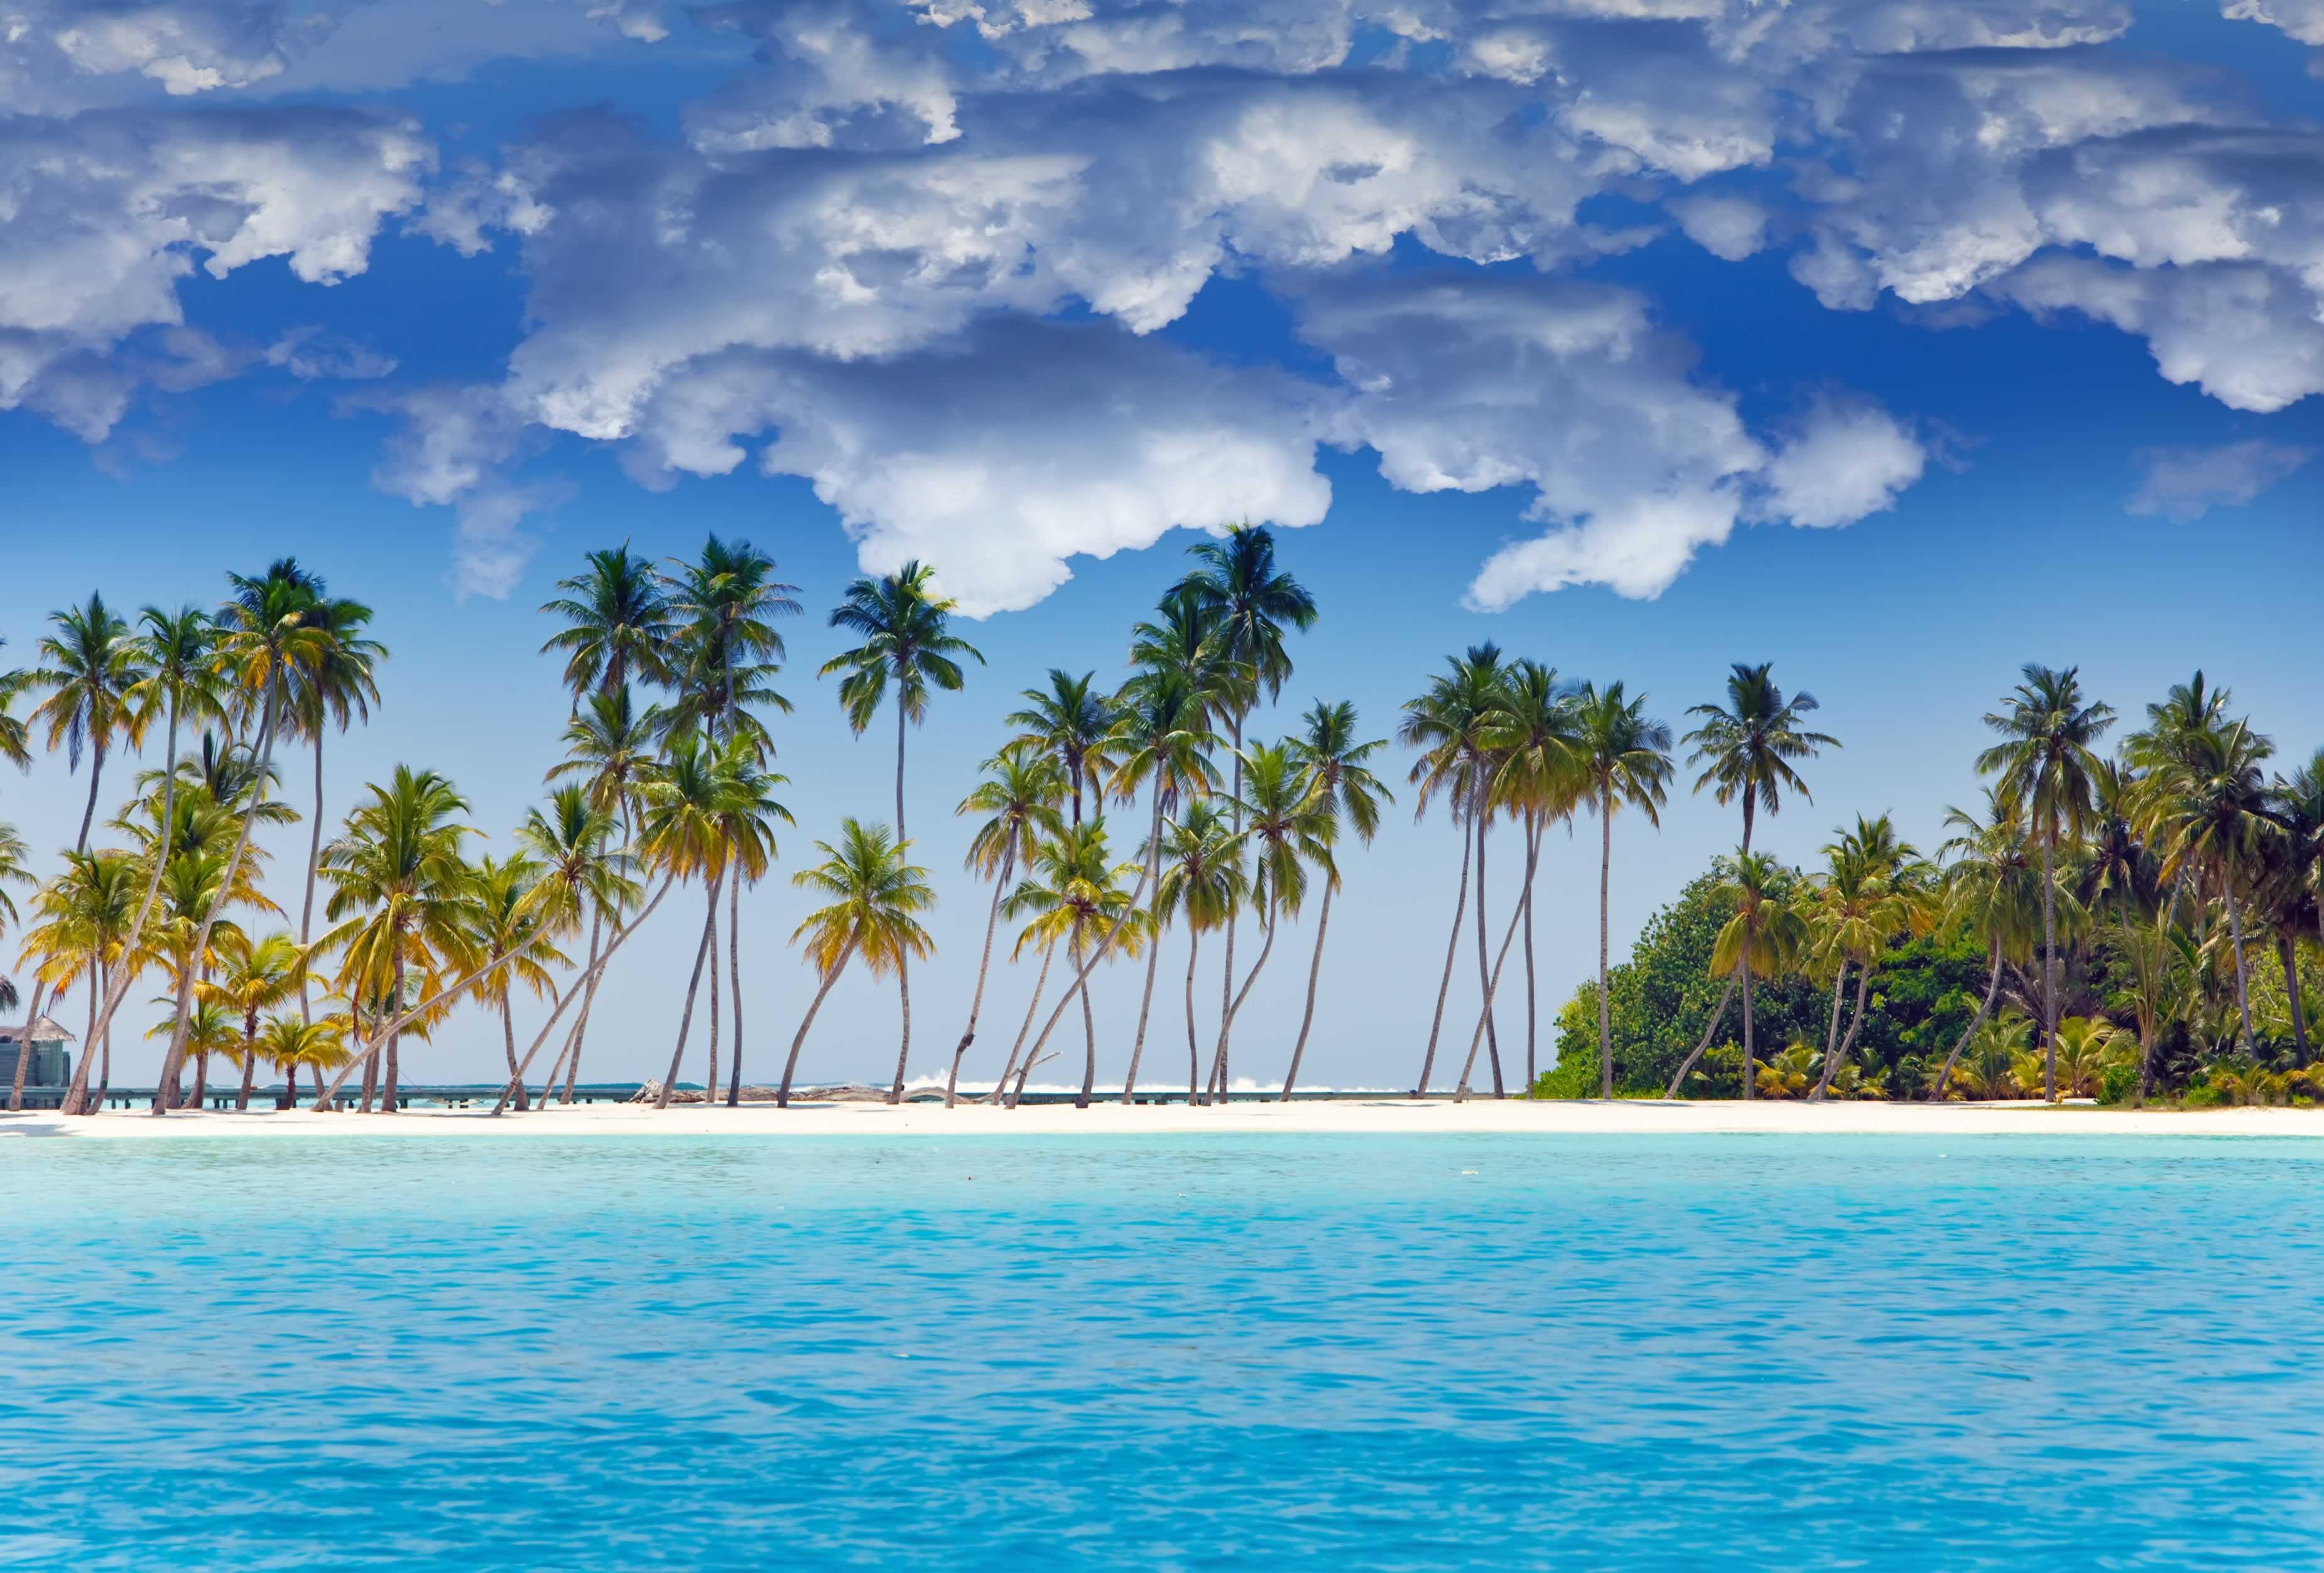 Archipelago Resorts Philippines Asia Private Islands